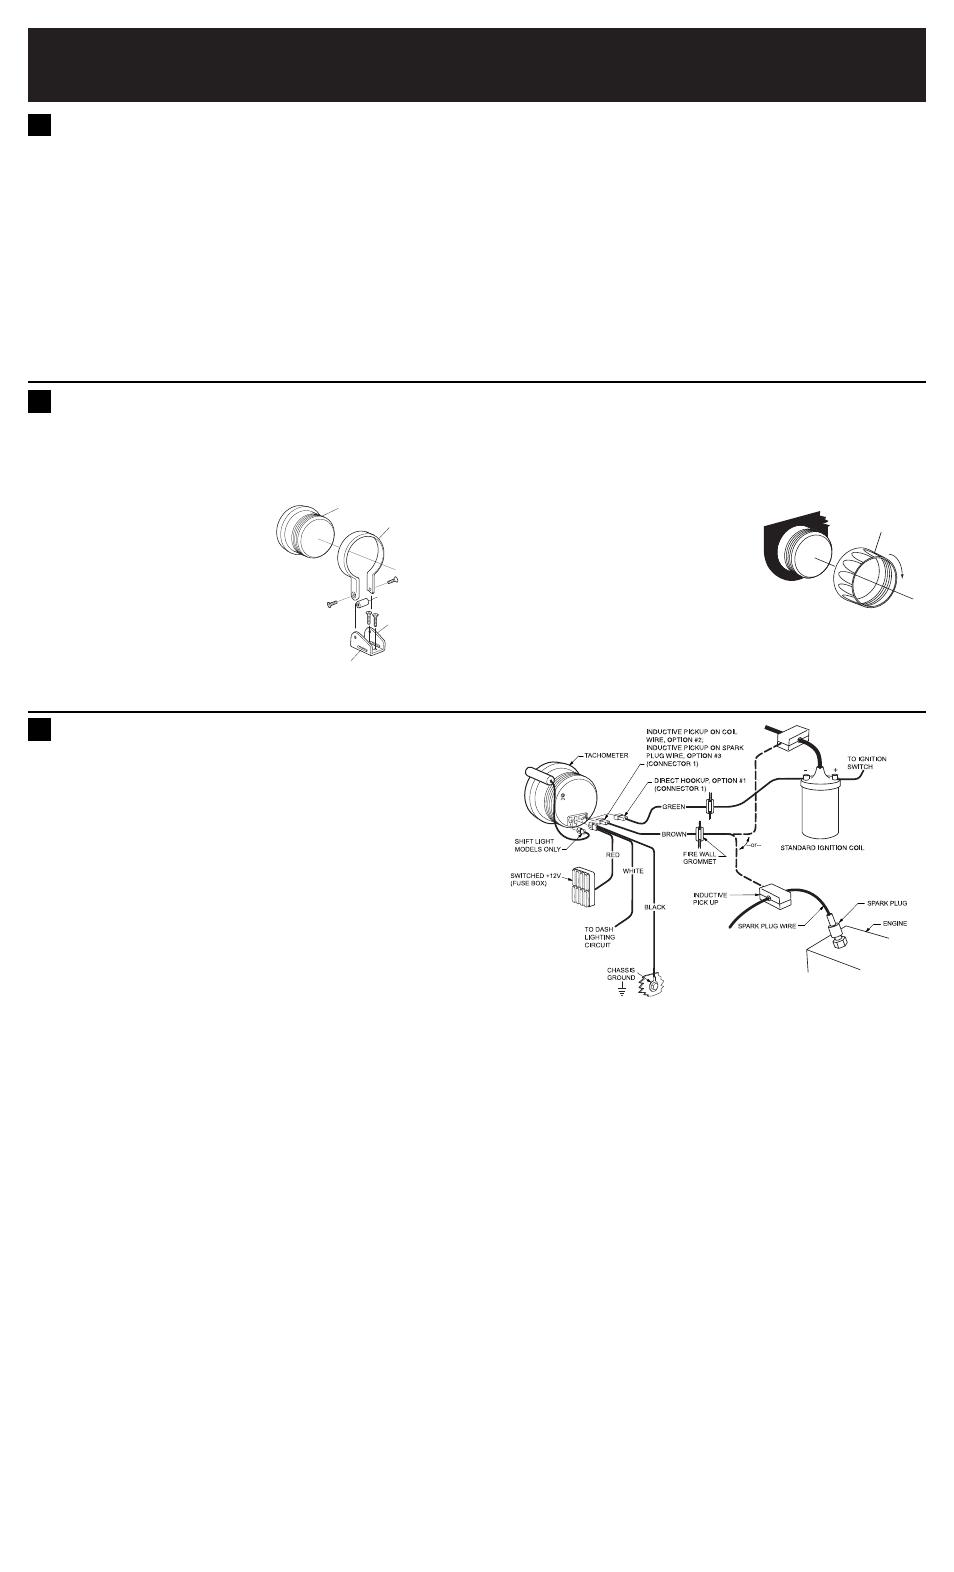 medium resolution of equus tach wiring wiring diagram for youequus 8080 5 shift light tachometer dis user